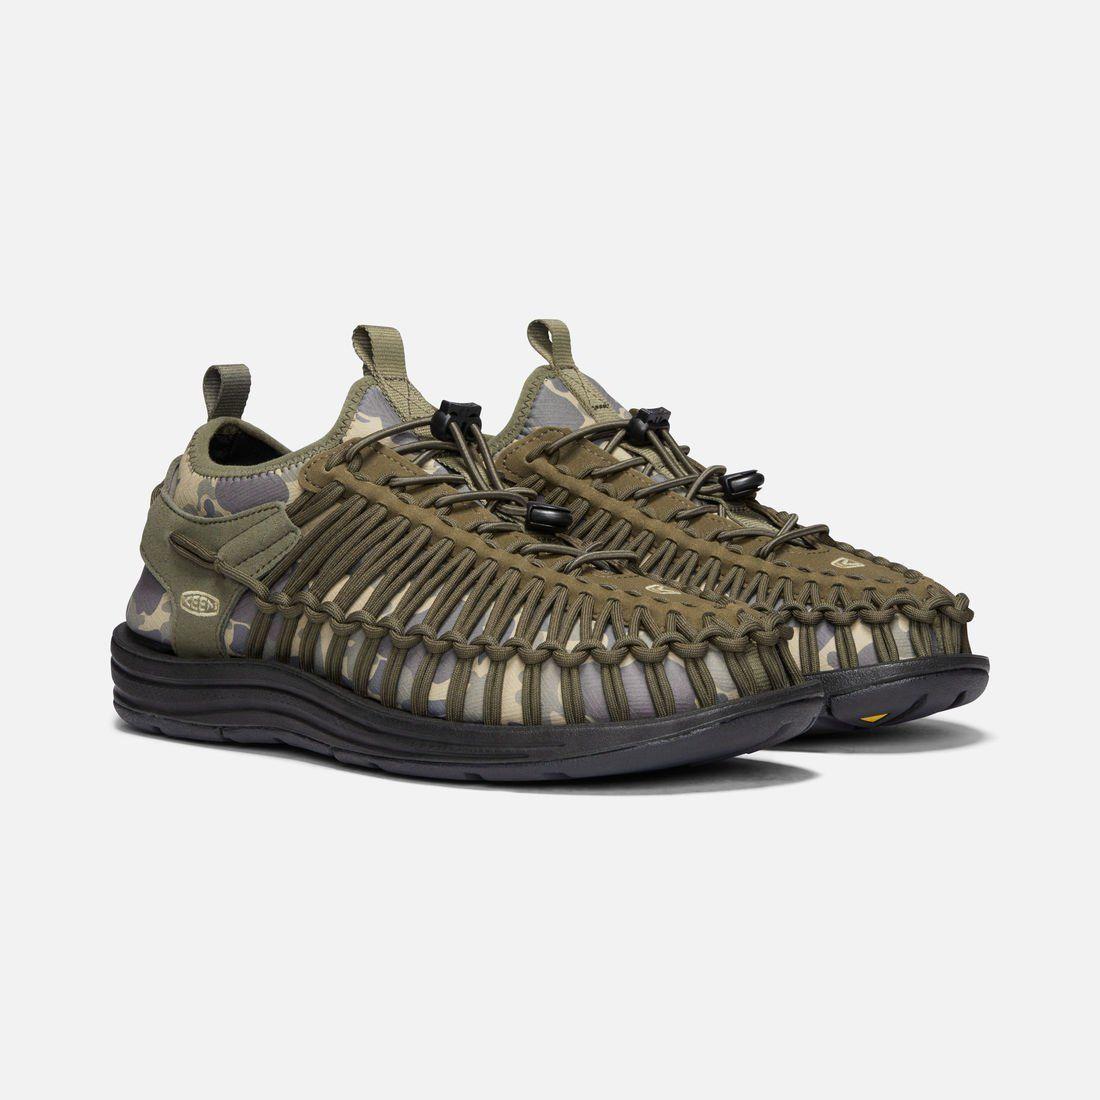 Keen Uneek HT Size US 7 M (B) EU 37.5 Women's Sport Sandals Olive / Camo